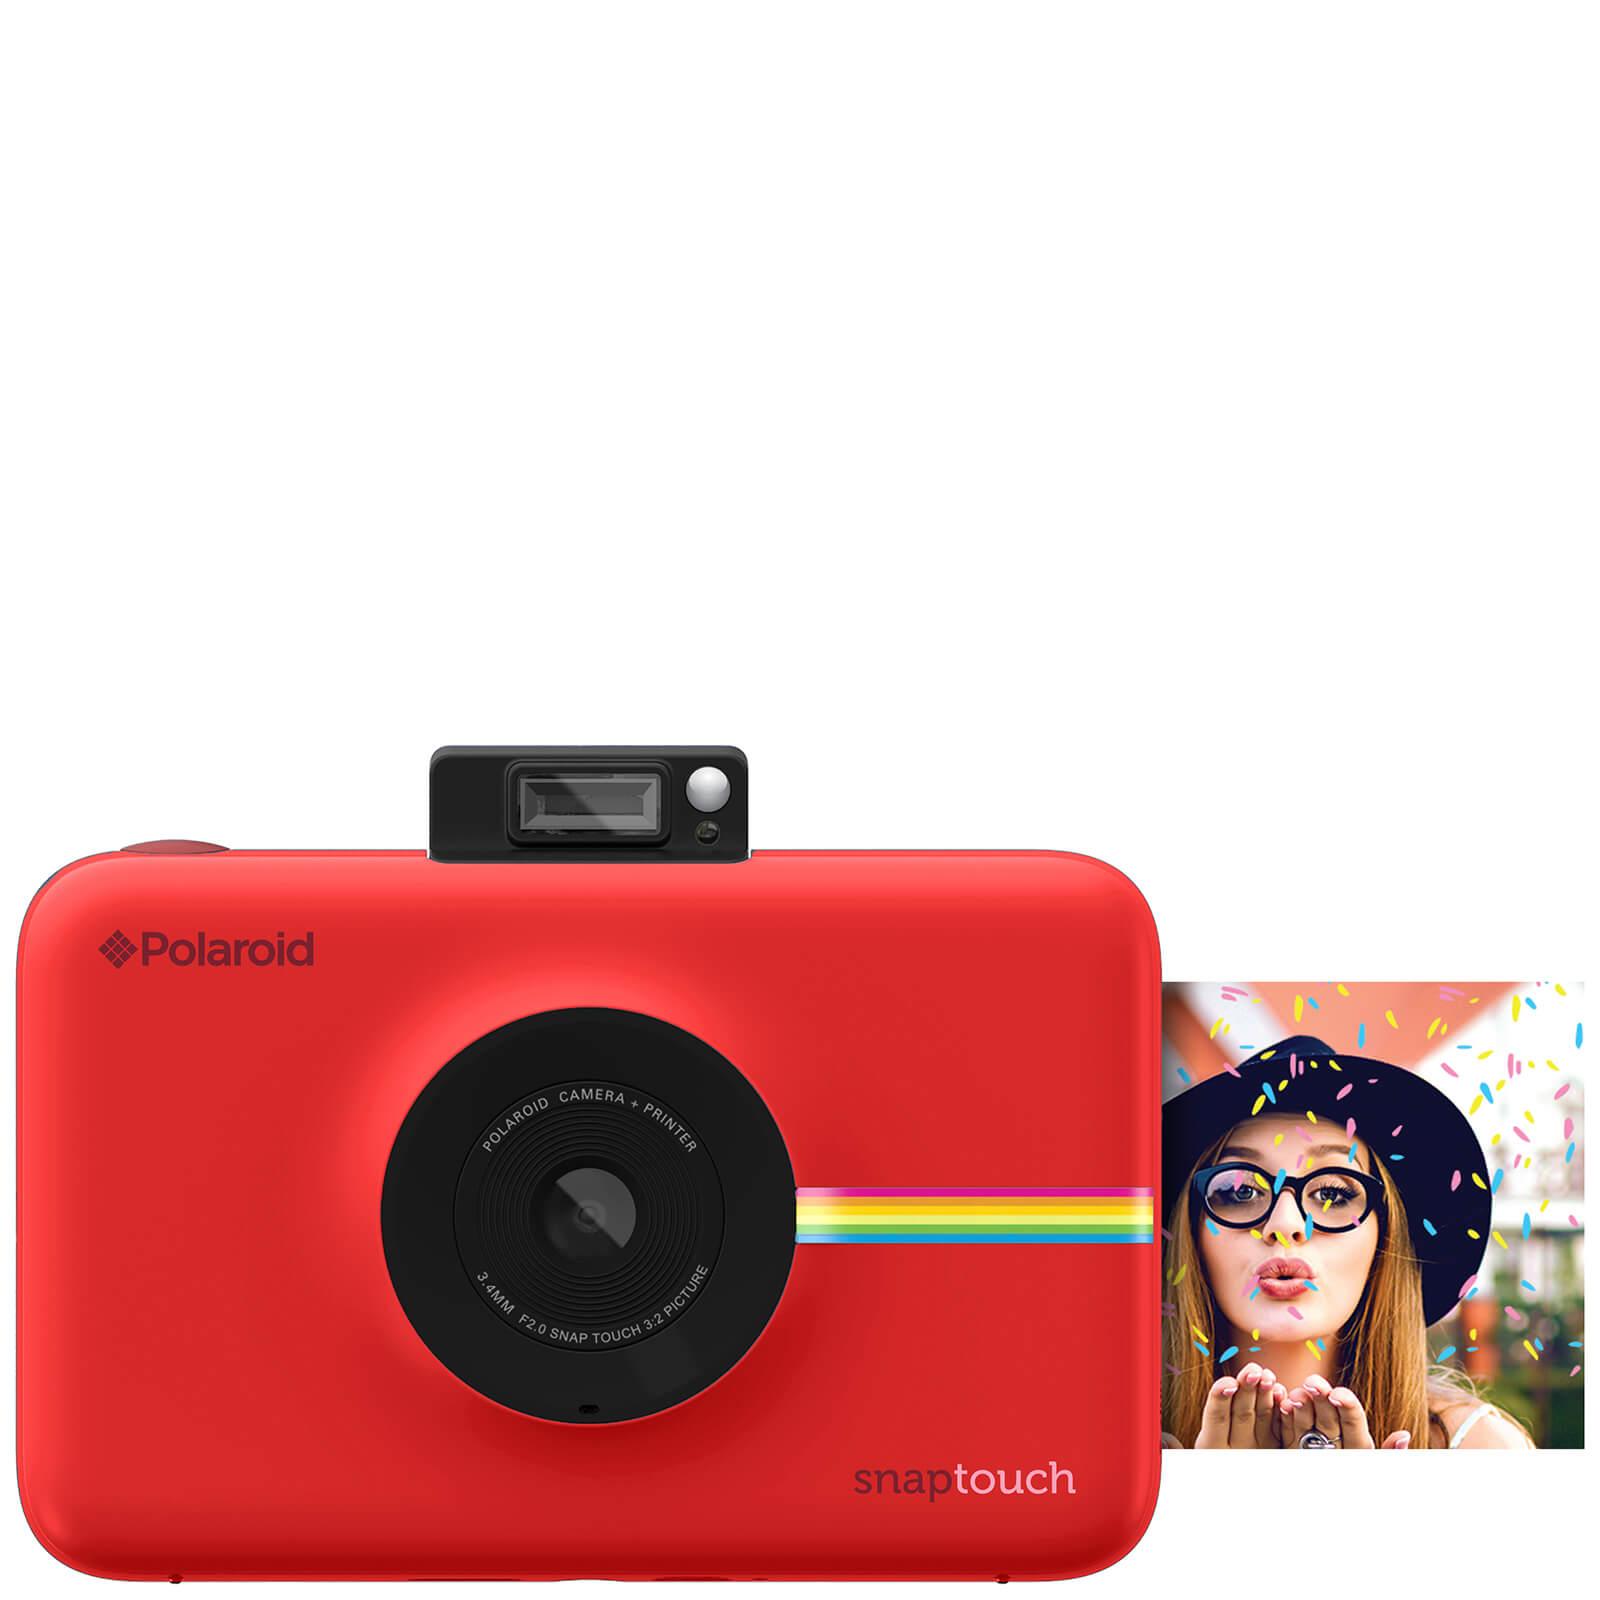 polaroid schnappschuss sofortdruck digitalkamera mit lcd display rot sowia. Black Bedroom Furniture Sets. Home Design Ideas